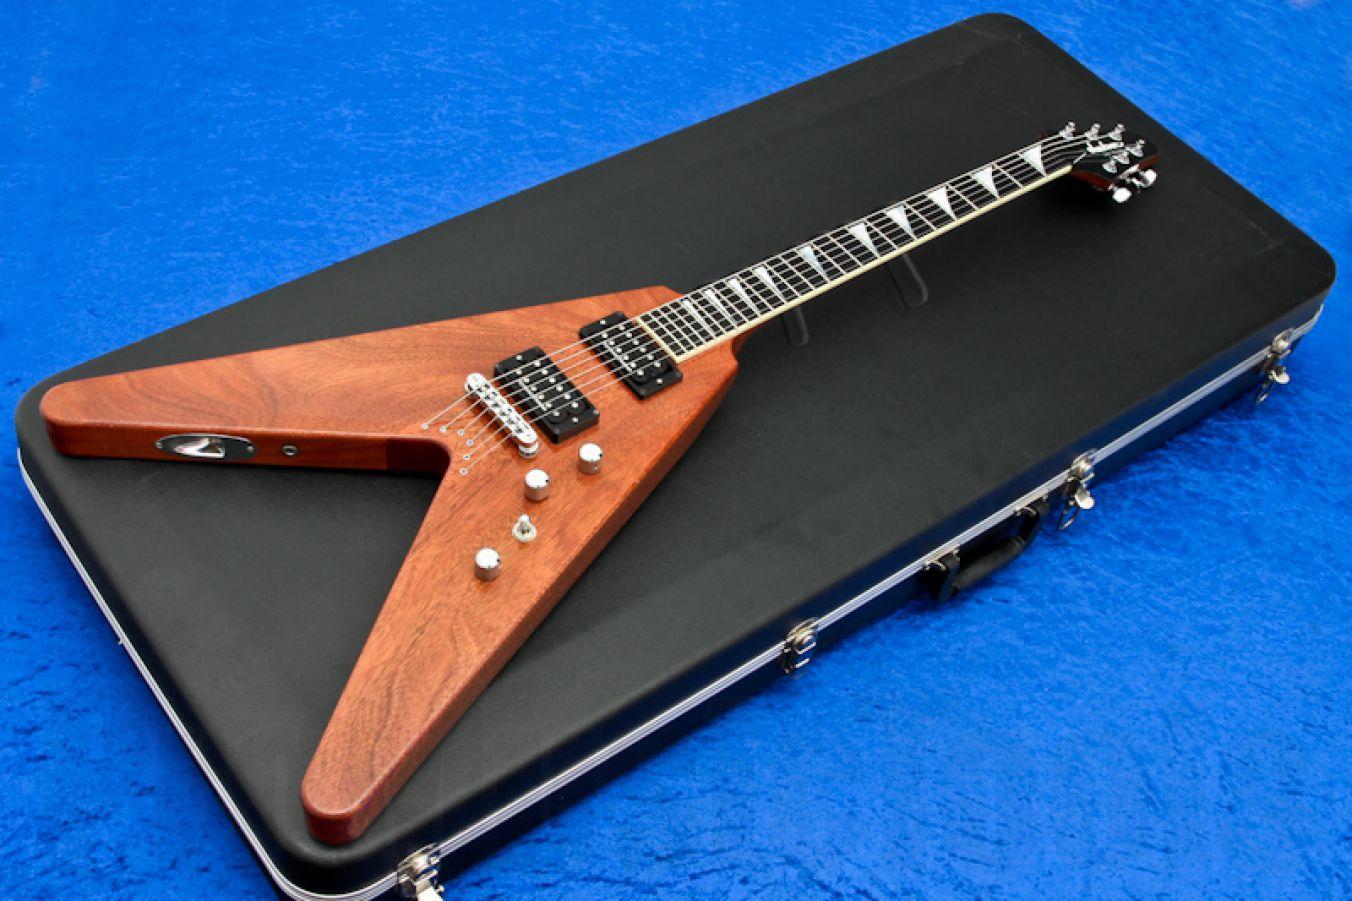 Jackson USA Y2KV Dave Mustaine - Natural Mahogany